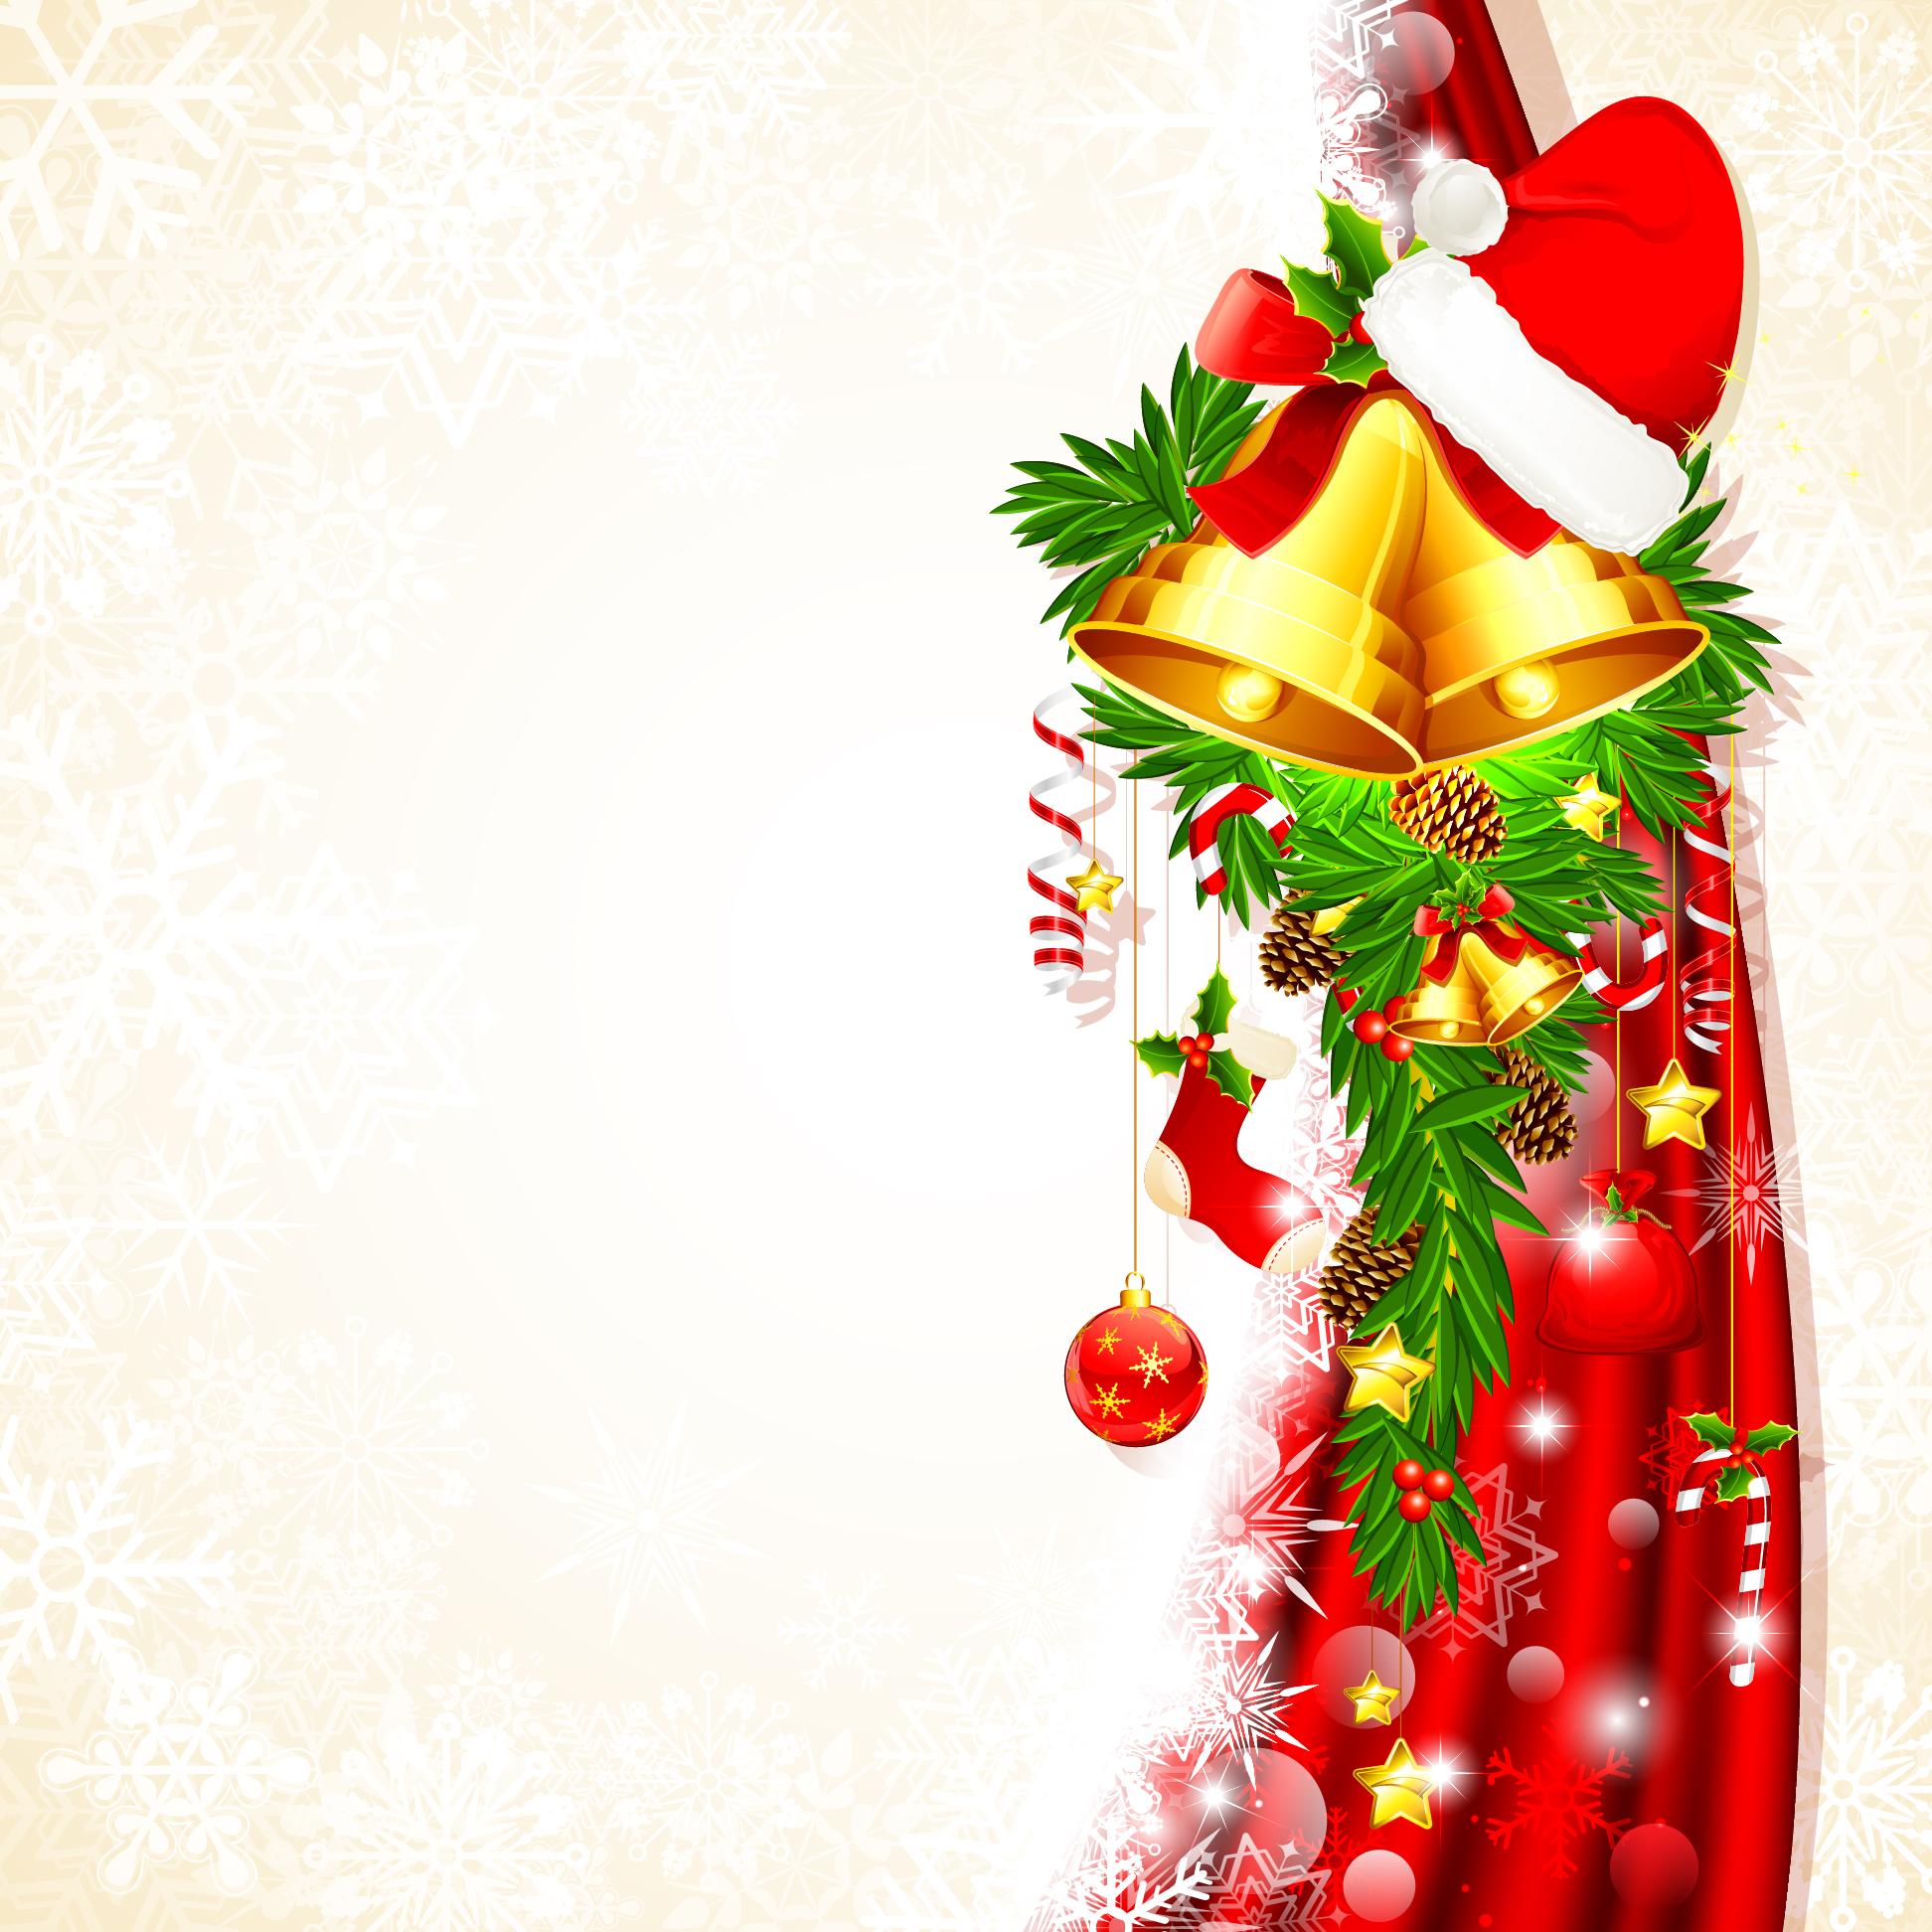 Christmas background clip art clipart best for Christmas theme design